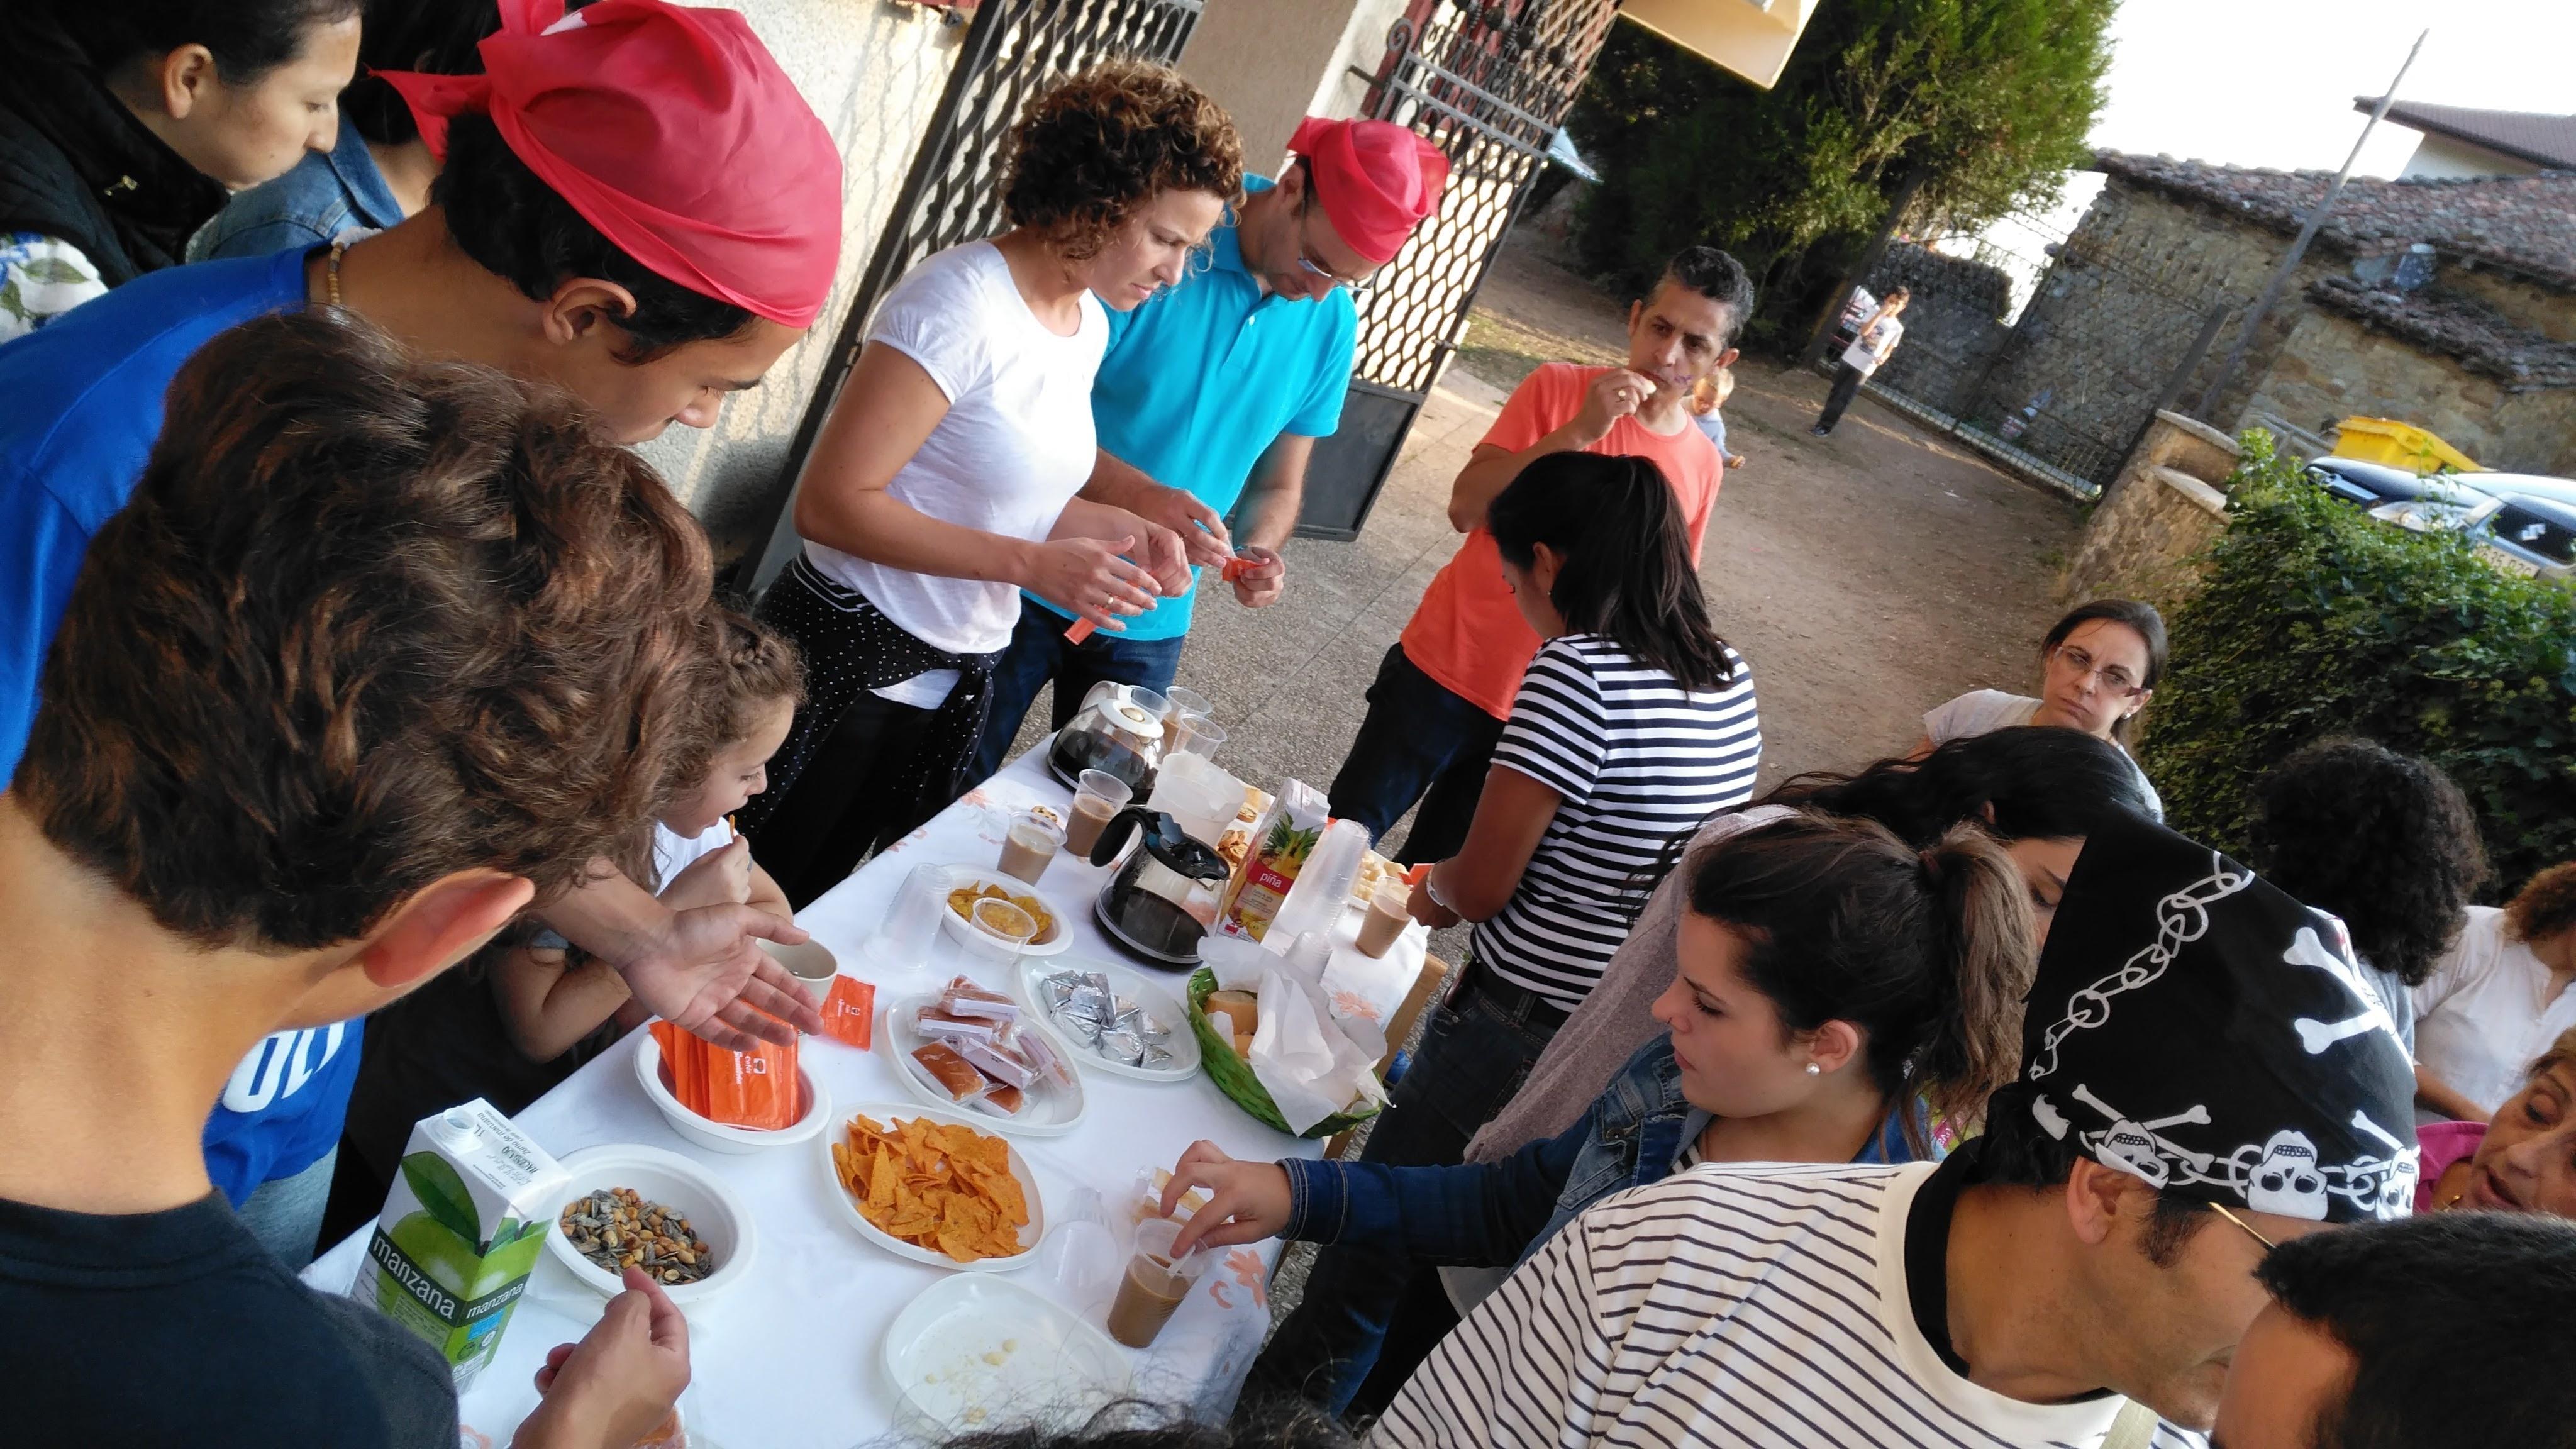 Picasa - 2015.09.12-13 - Convivencia Sector Familias(15).jpg